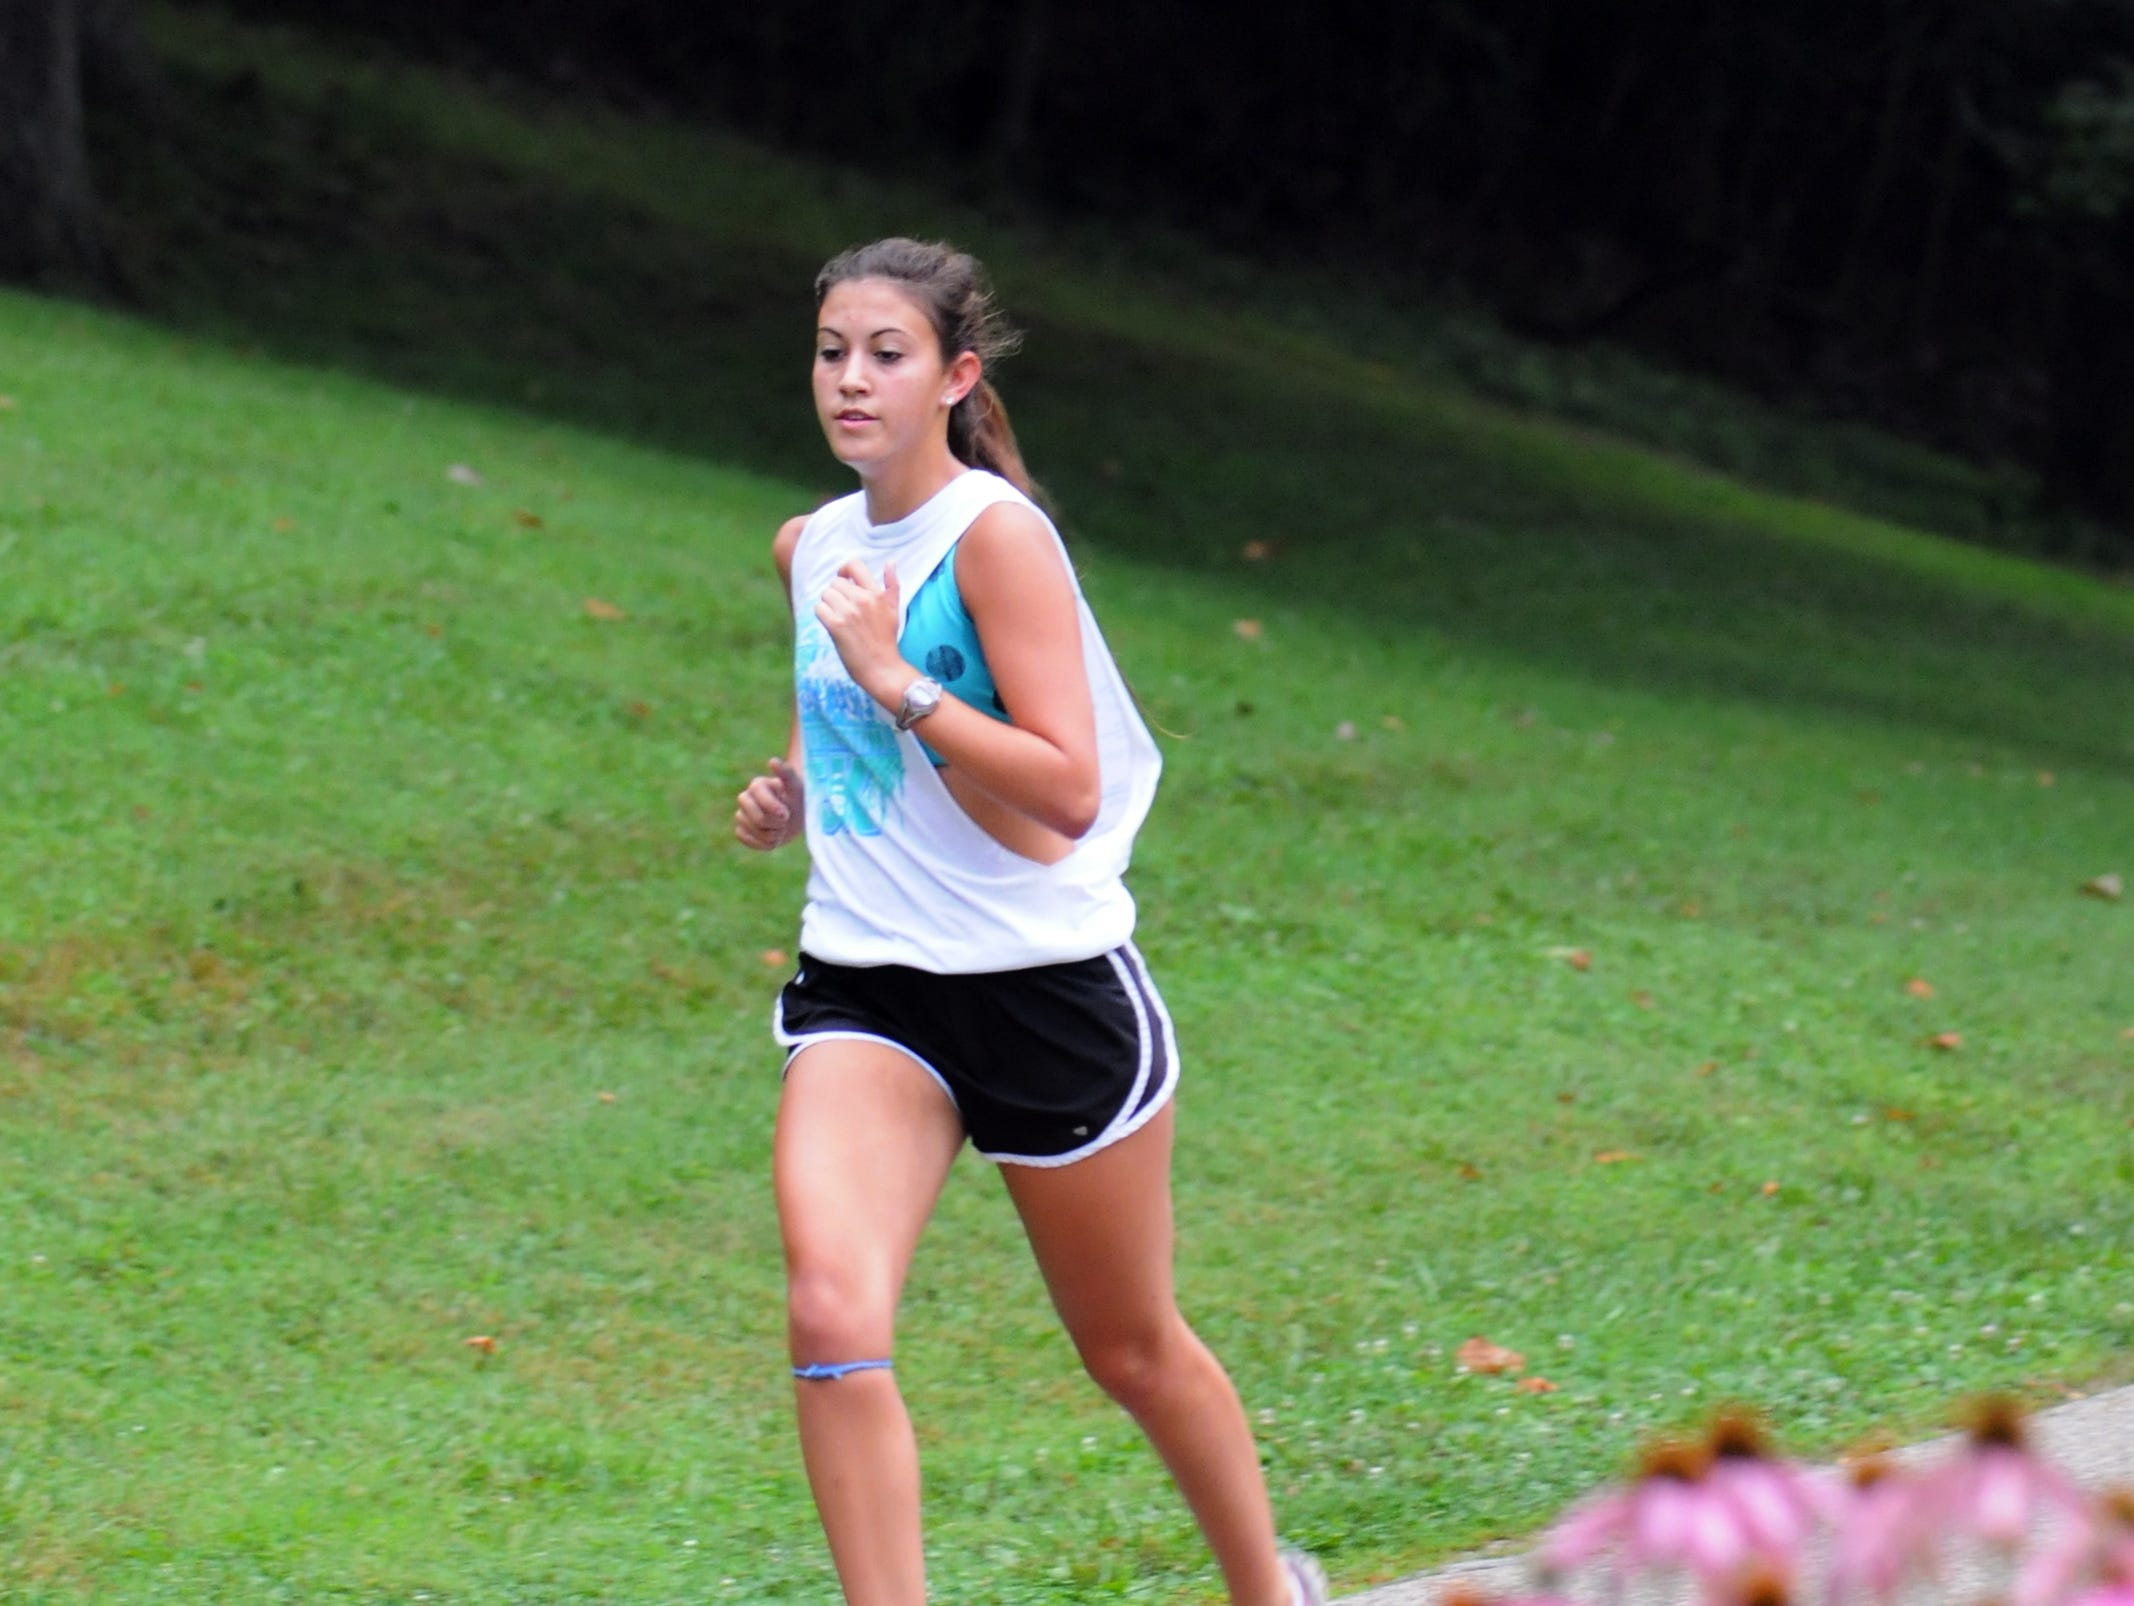 Lancaster senior Savannah McCray runs during the Golden Gales practice Aug. 12 at Rising Park in Lancaster.